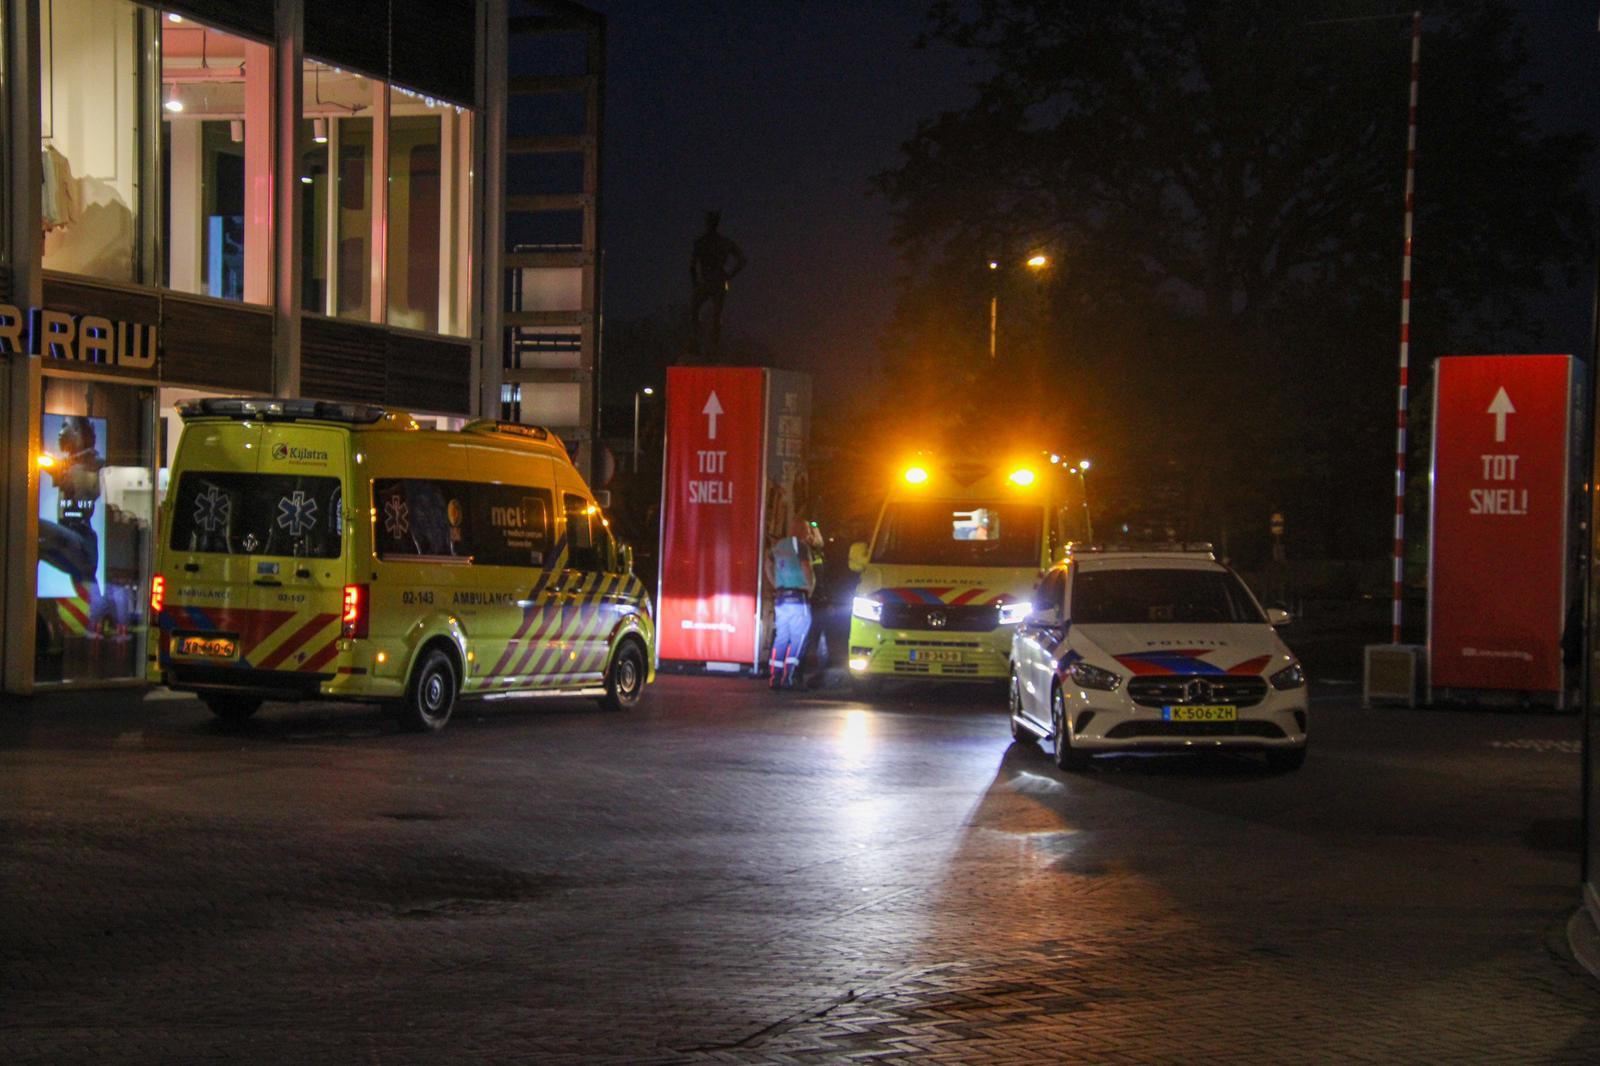 man raakt gewond na steekincident in Leeuwarden